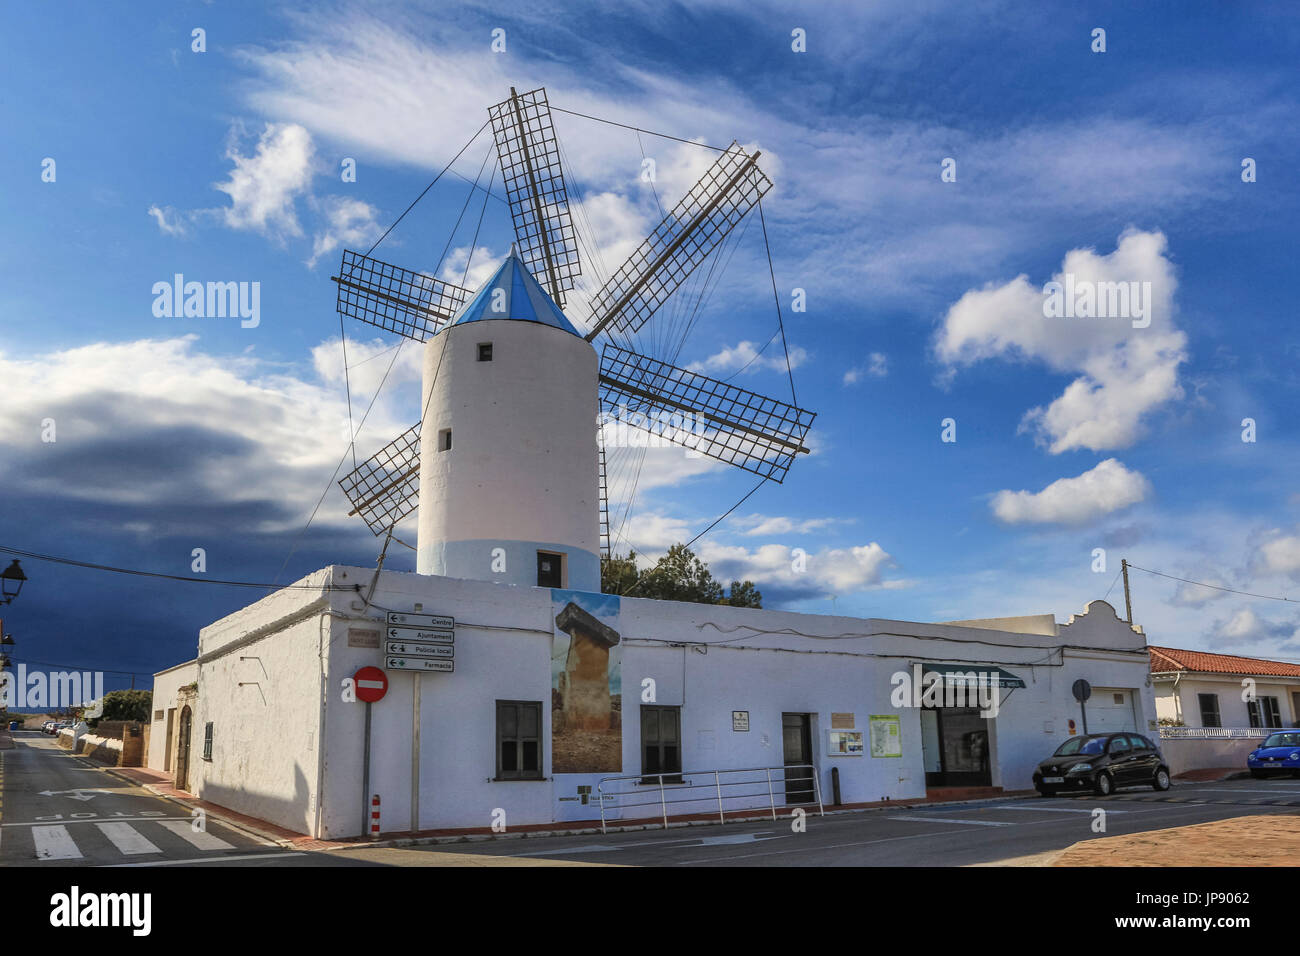 Spain, Balearic Islands, Menorca Island, Sant Lluis City, - Stock Image